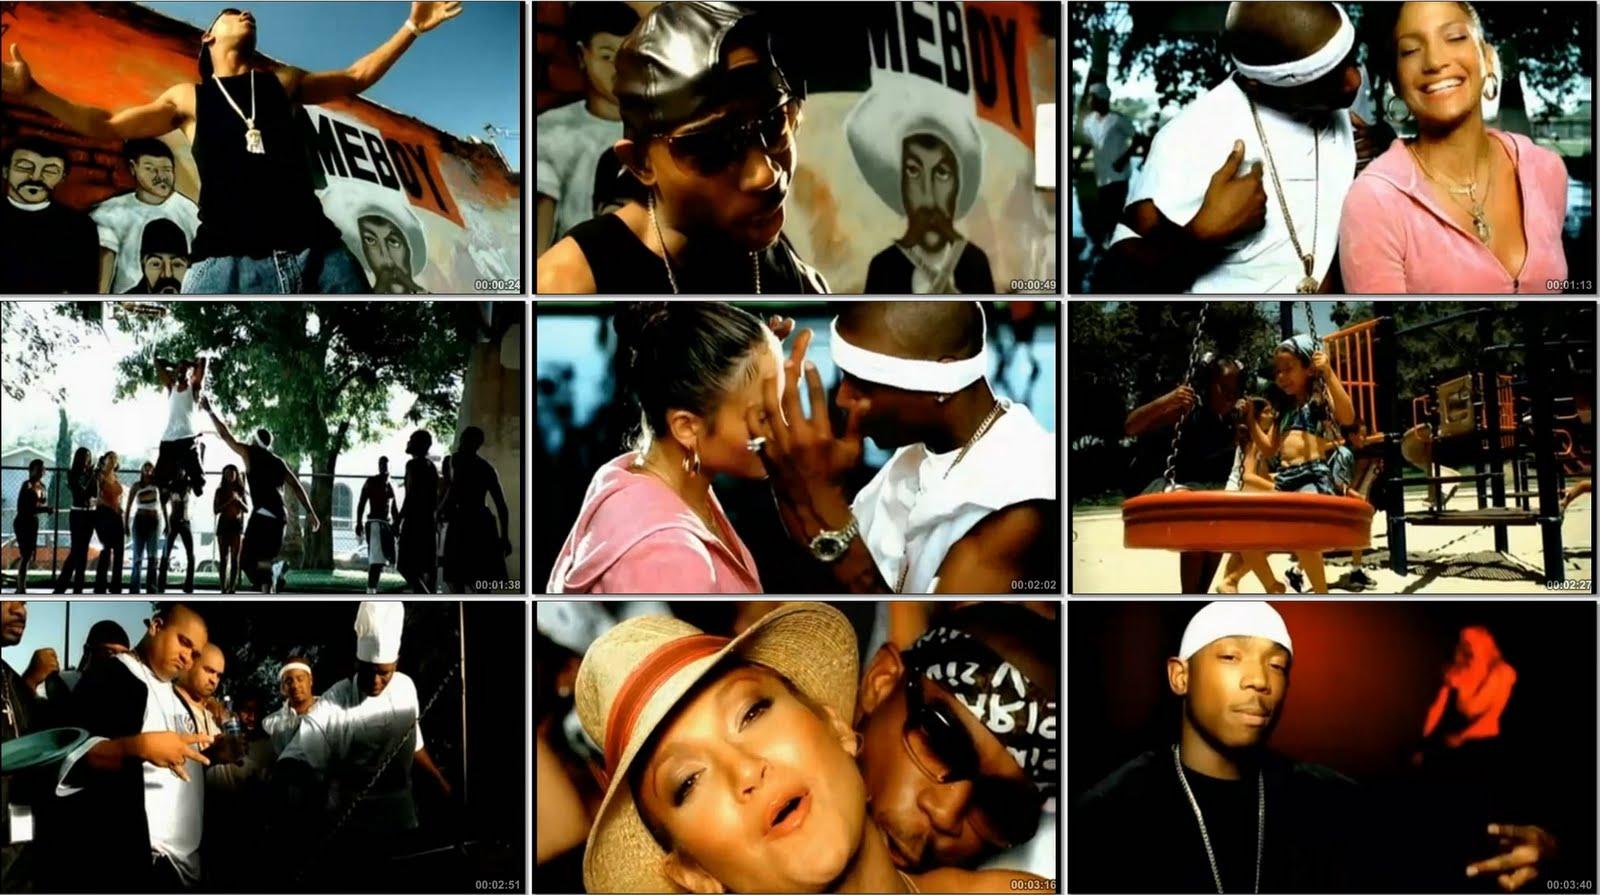 http://1.bp.blogspot.com/-43cPgKj1v00/TiZDo1grdII/AAAAAAAADb8/xjybFwAufWY/s1600/Jennifer+Lopez+Feat.+Ja+Rule+-+Im+Real.mp4_thumbs_%255B2011.07.19_17.01.20%255D.jpg